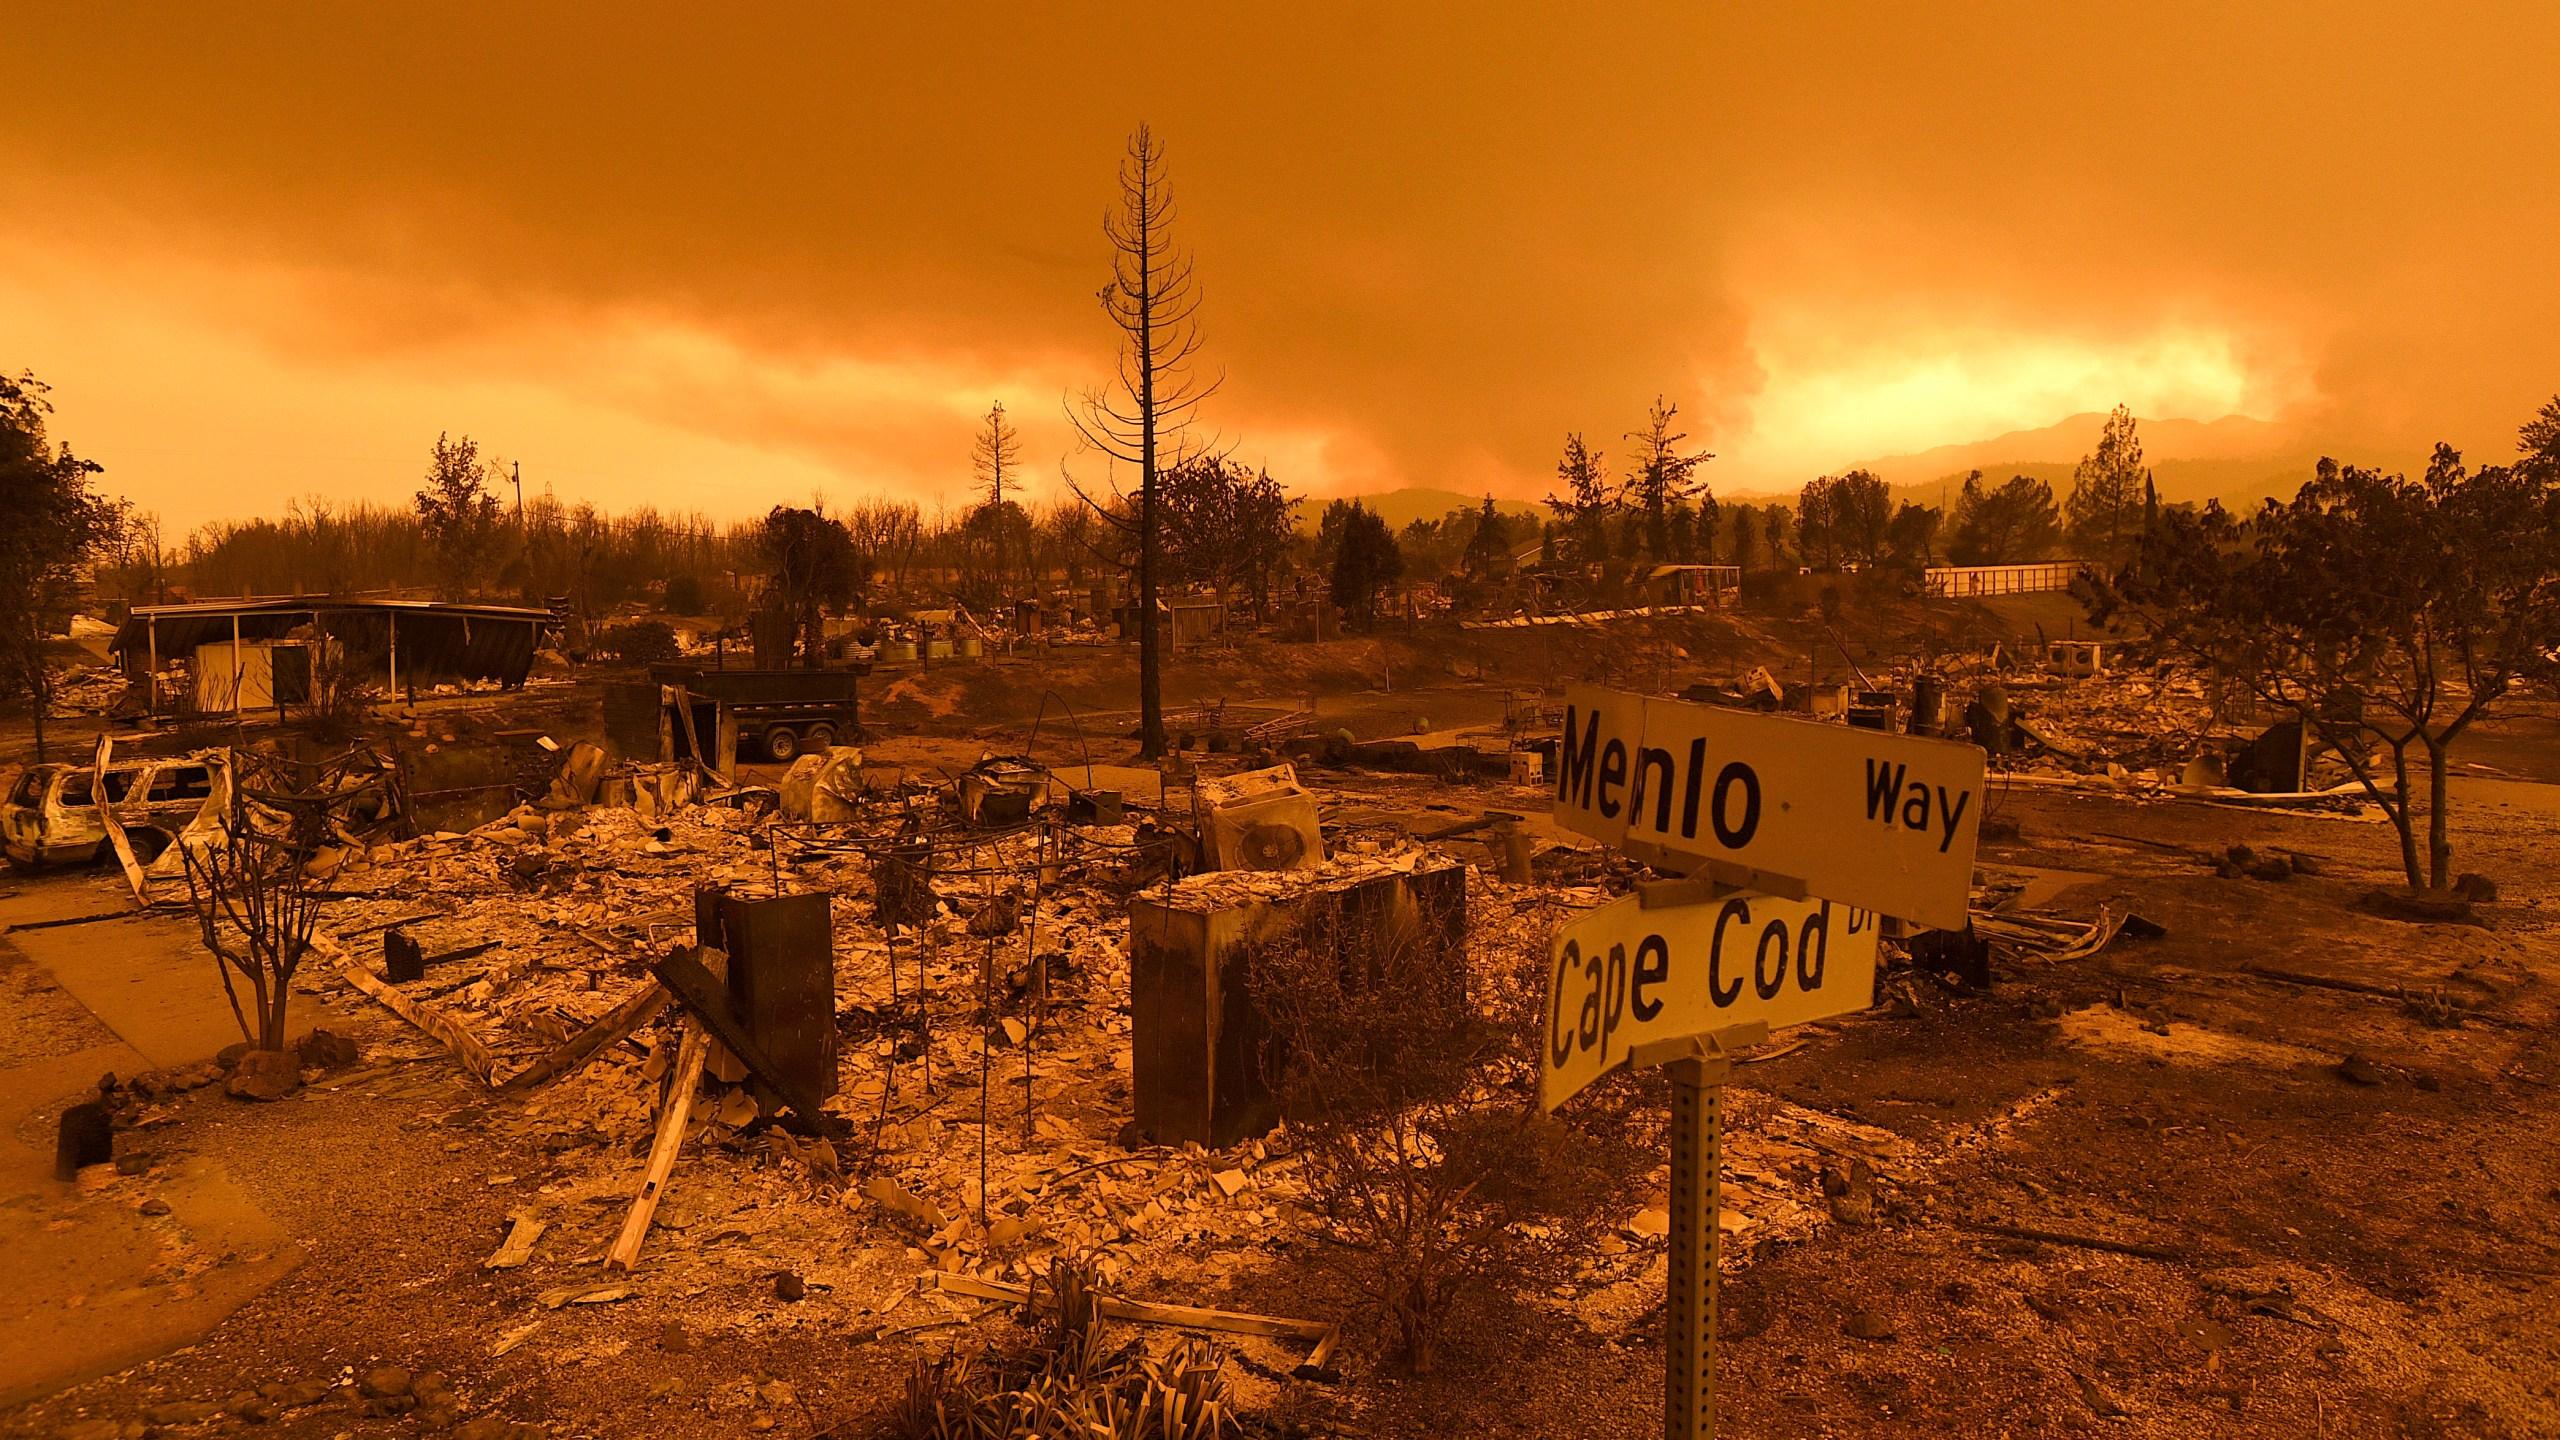 APTOPIX_California_Wildfires_37603-159532.jpg81281270